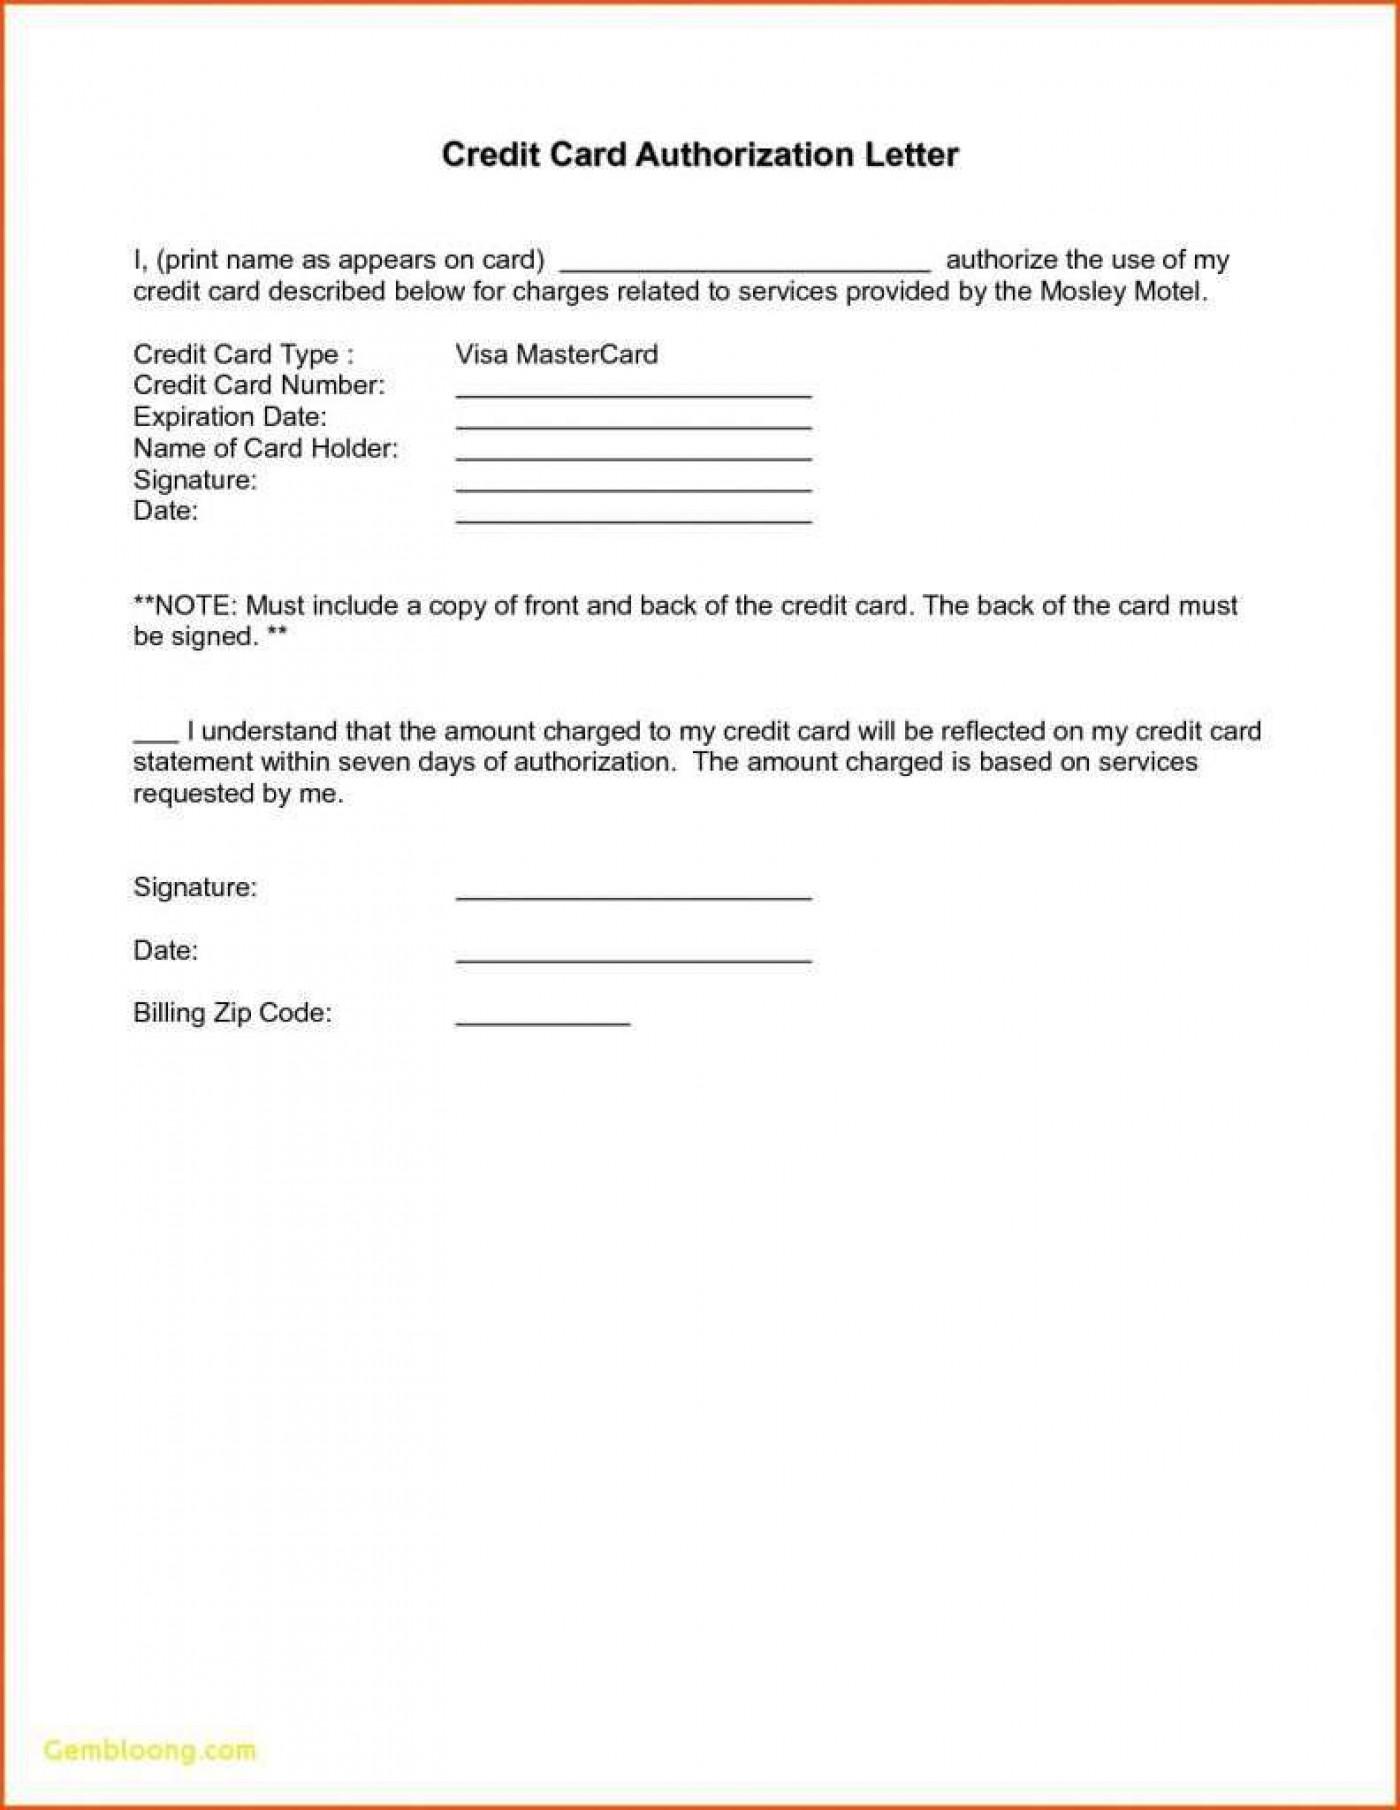 000 Remarkable Credit Card Usage Request Form Template Design 1400